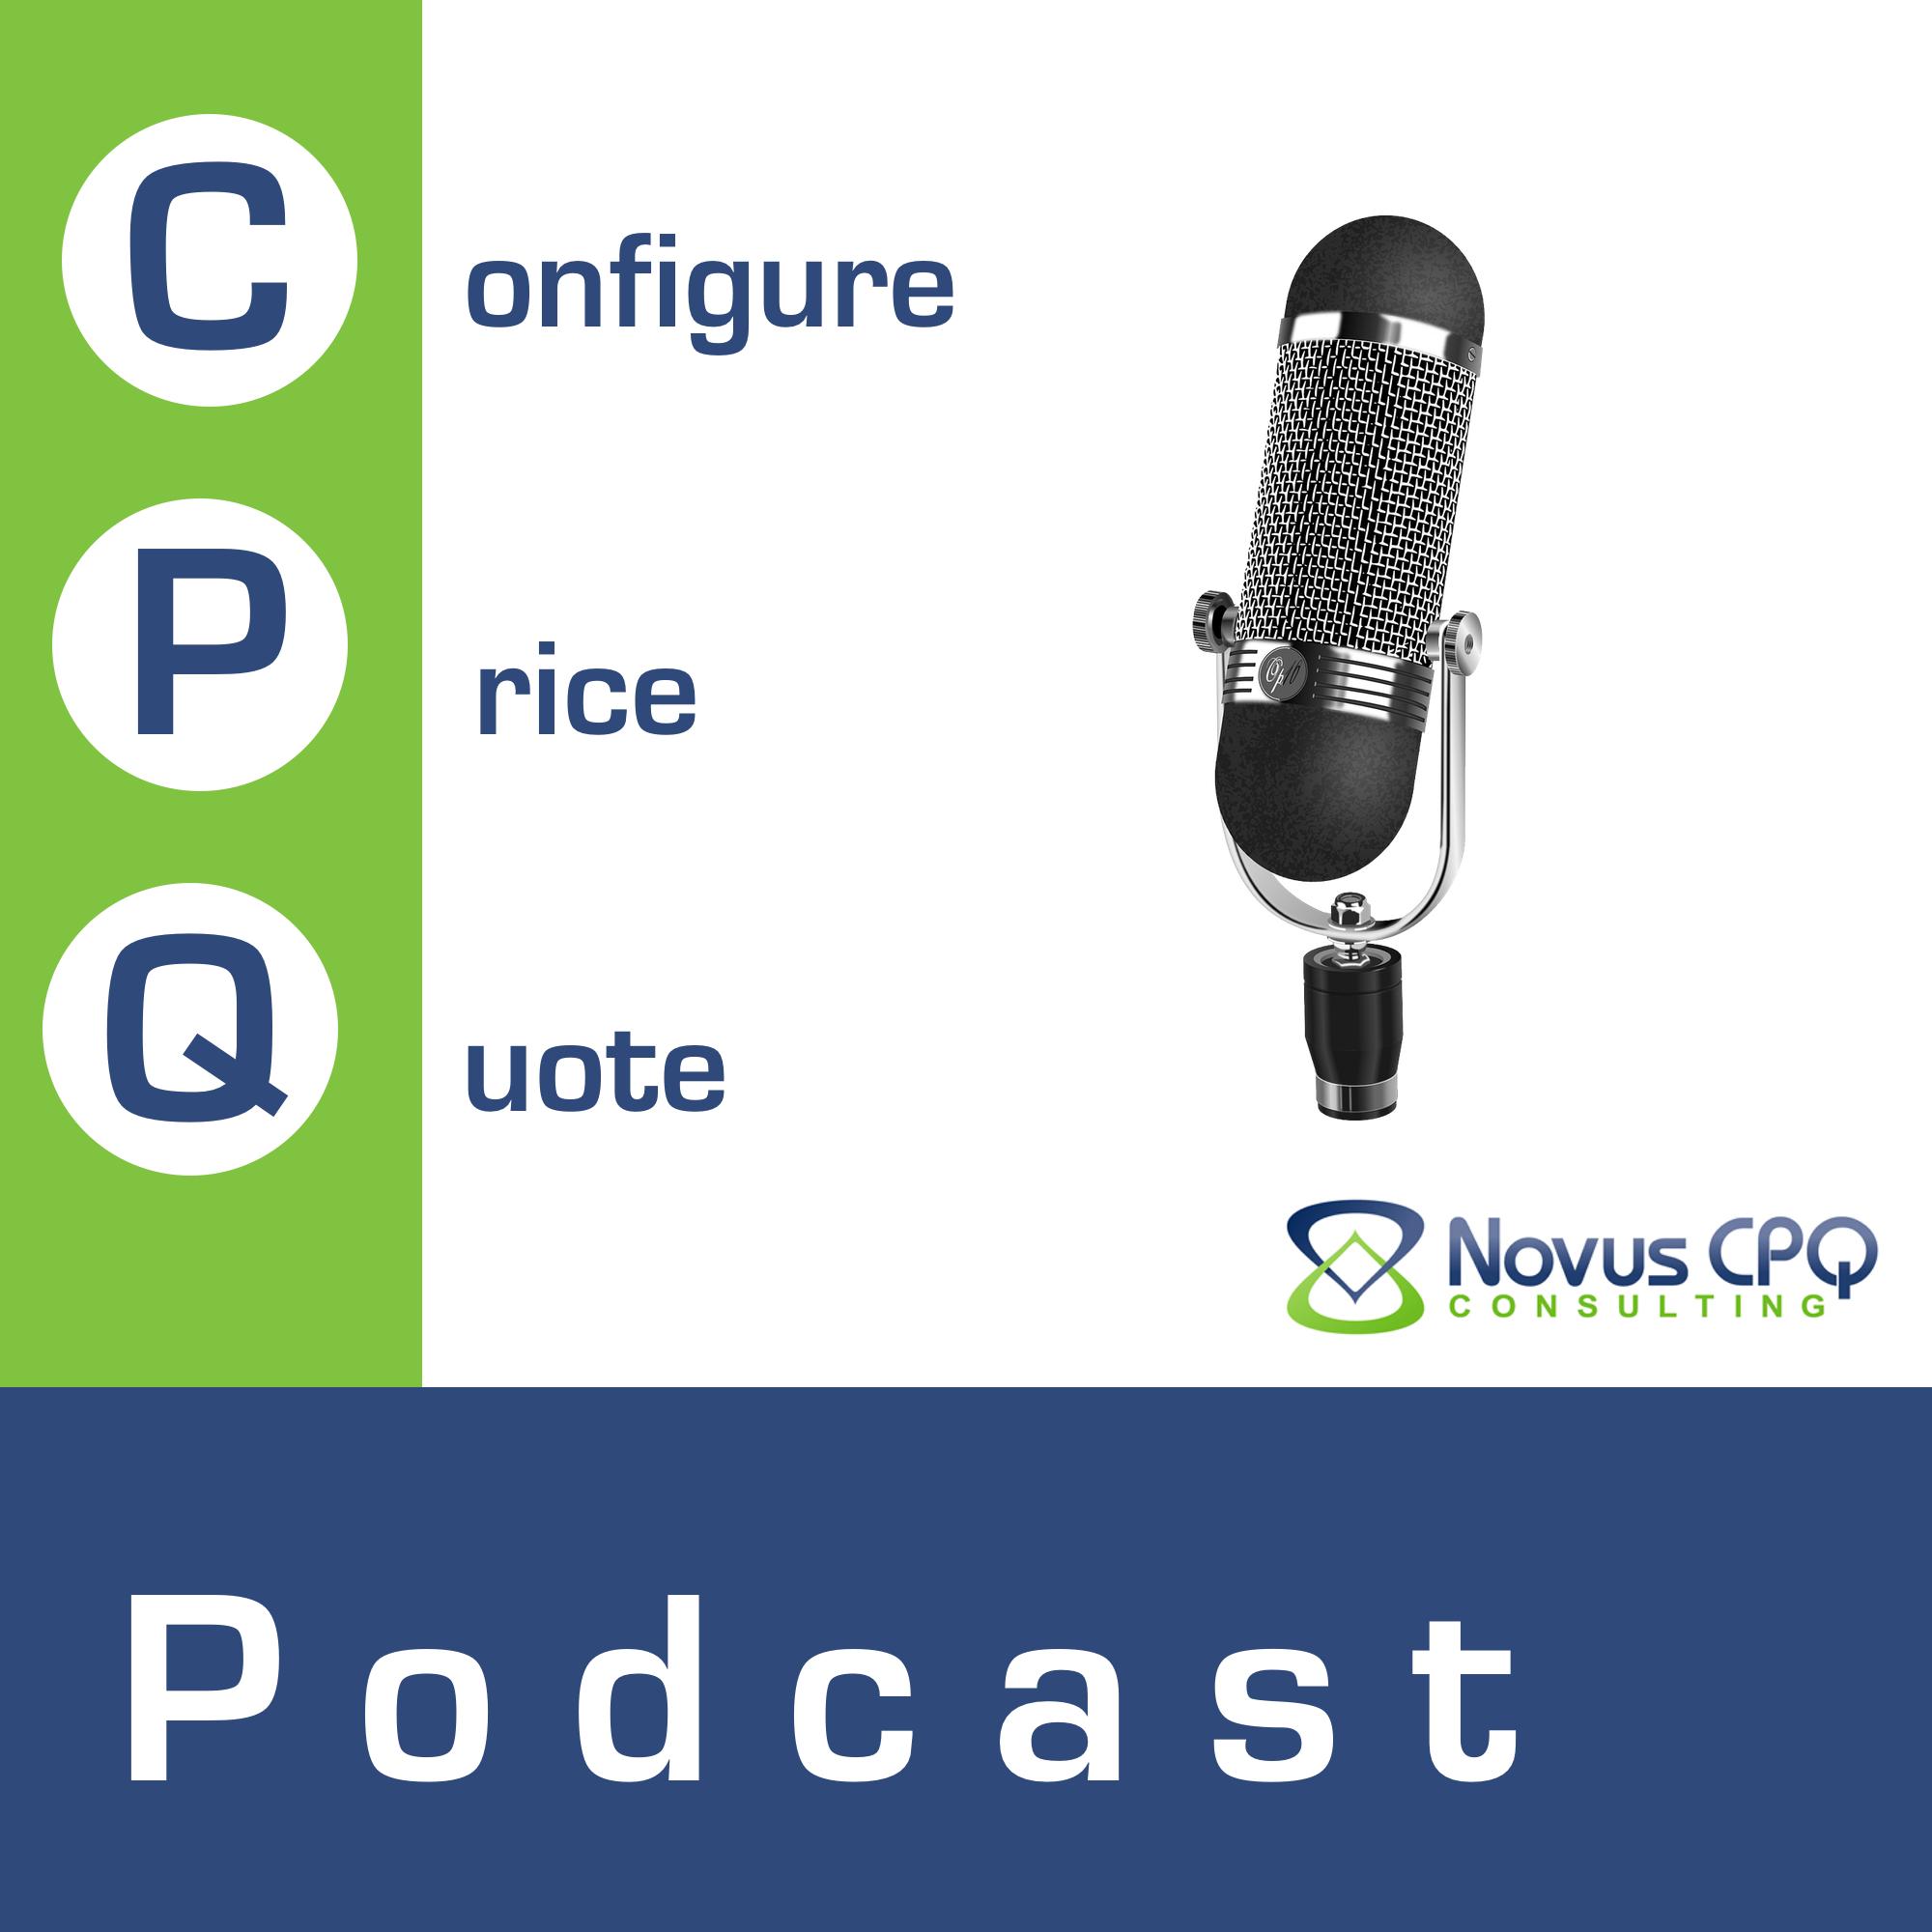 CPQ Podcast show art